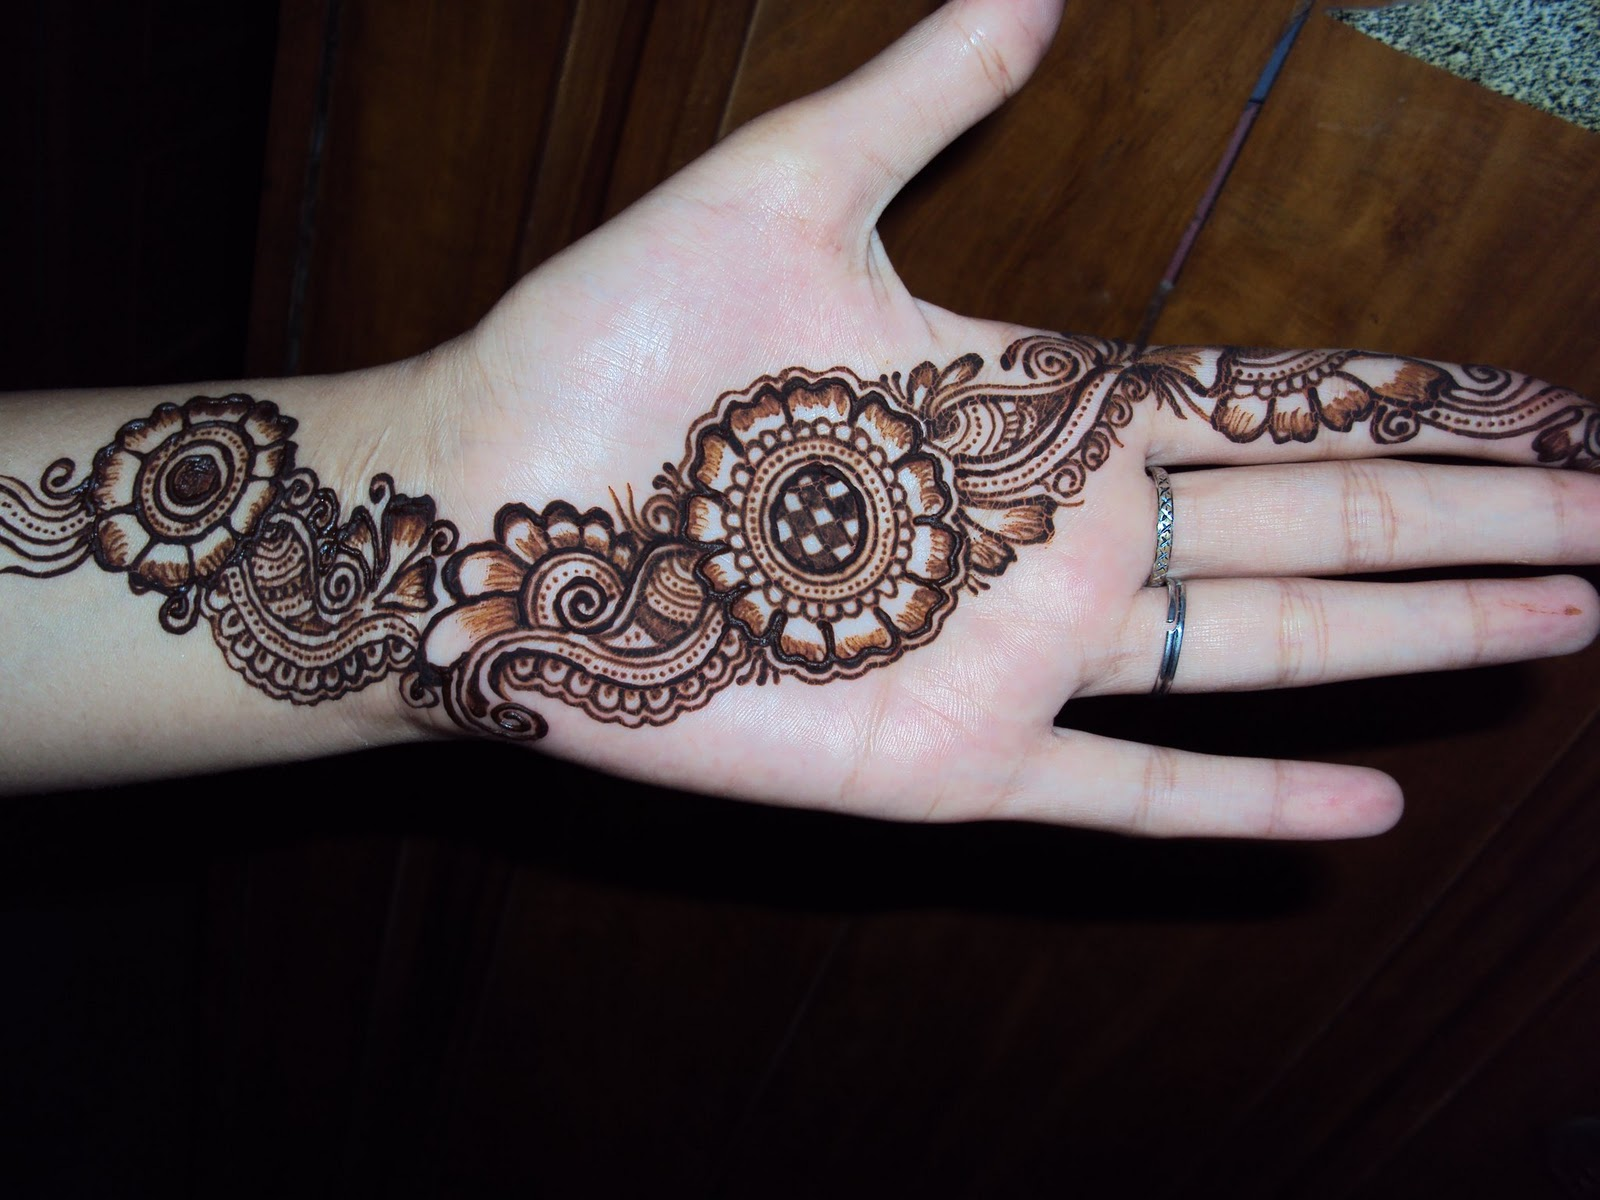 Simple and Beautiful Mehndi Designs | Simple Mehndi ...  Simple and Beau...